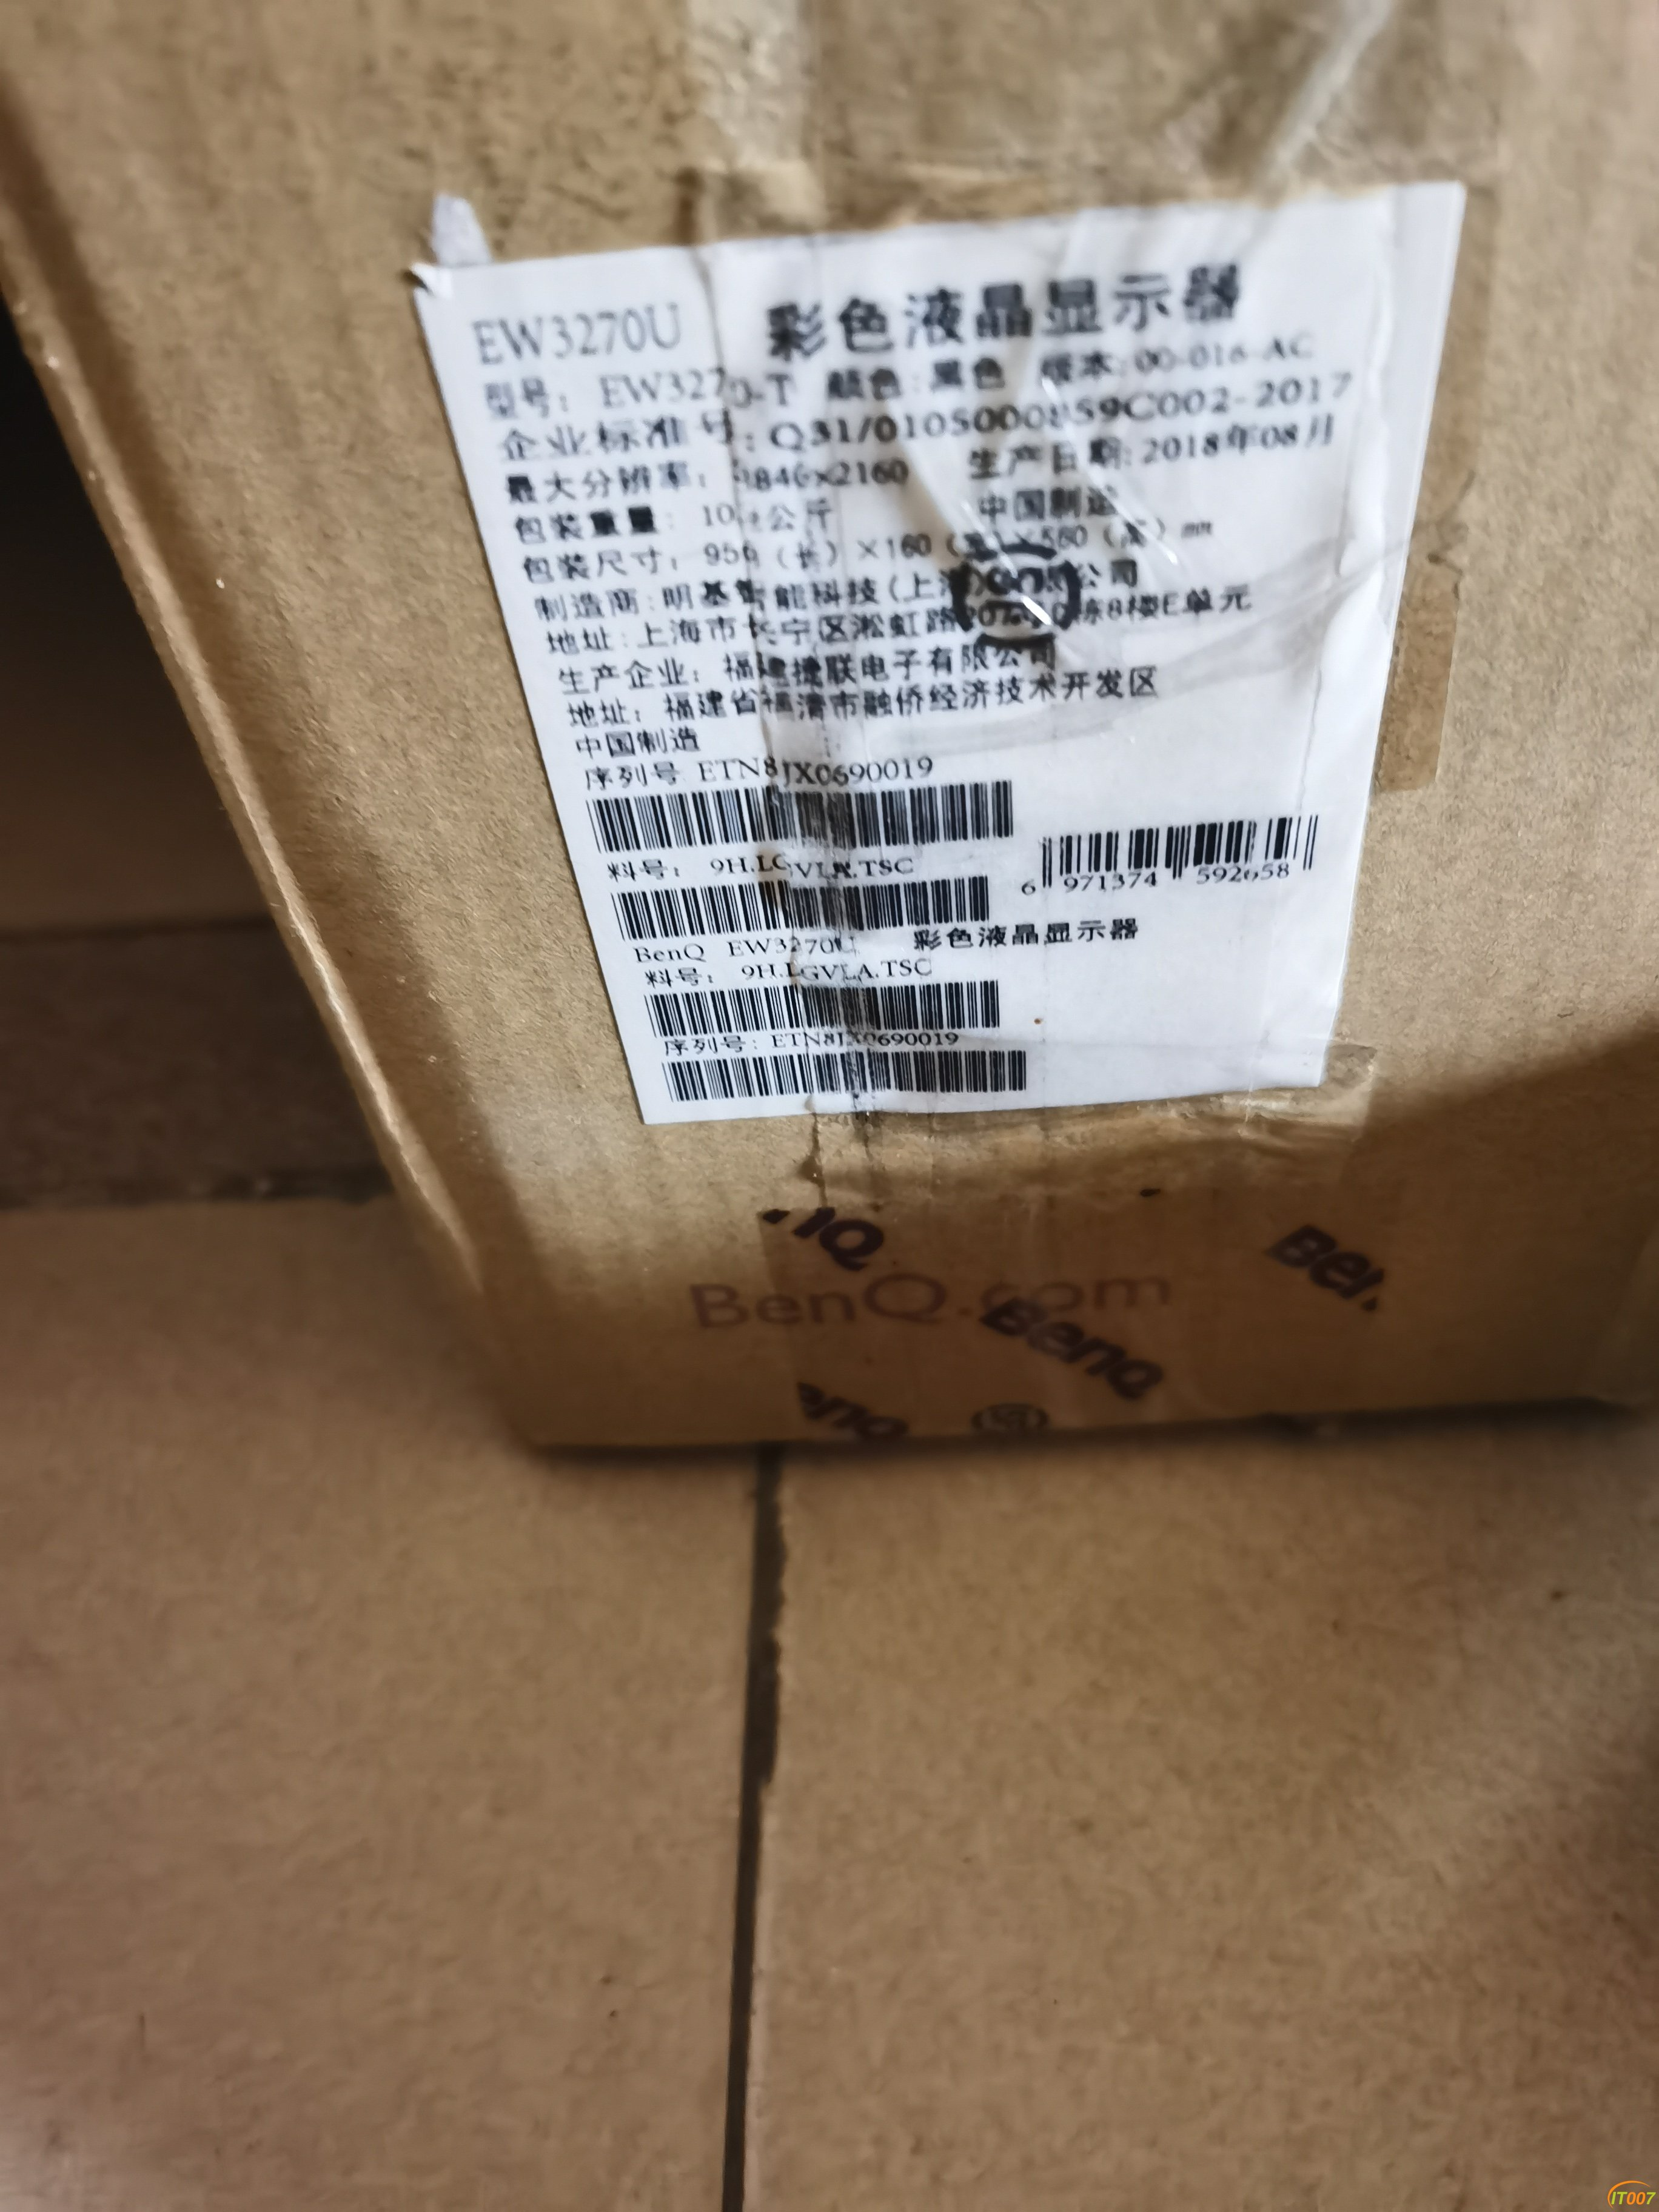 明基EW3270U显示器,95新,32英寸,4K,hdr, 10bit,2000出